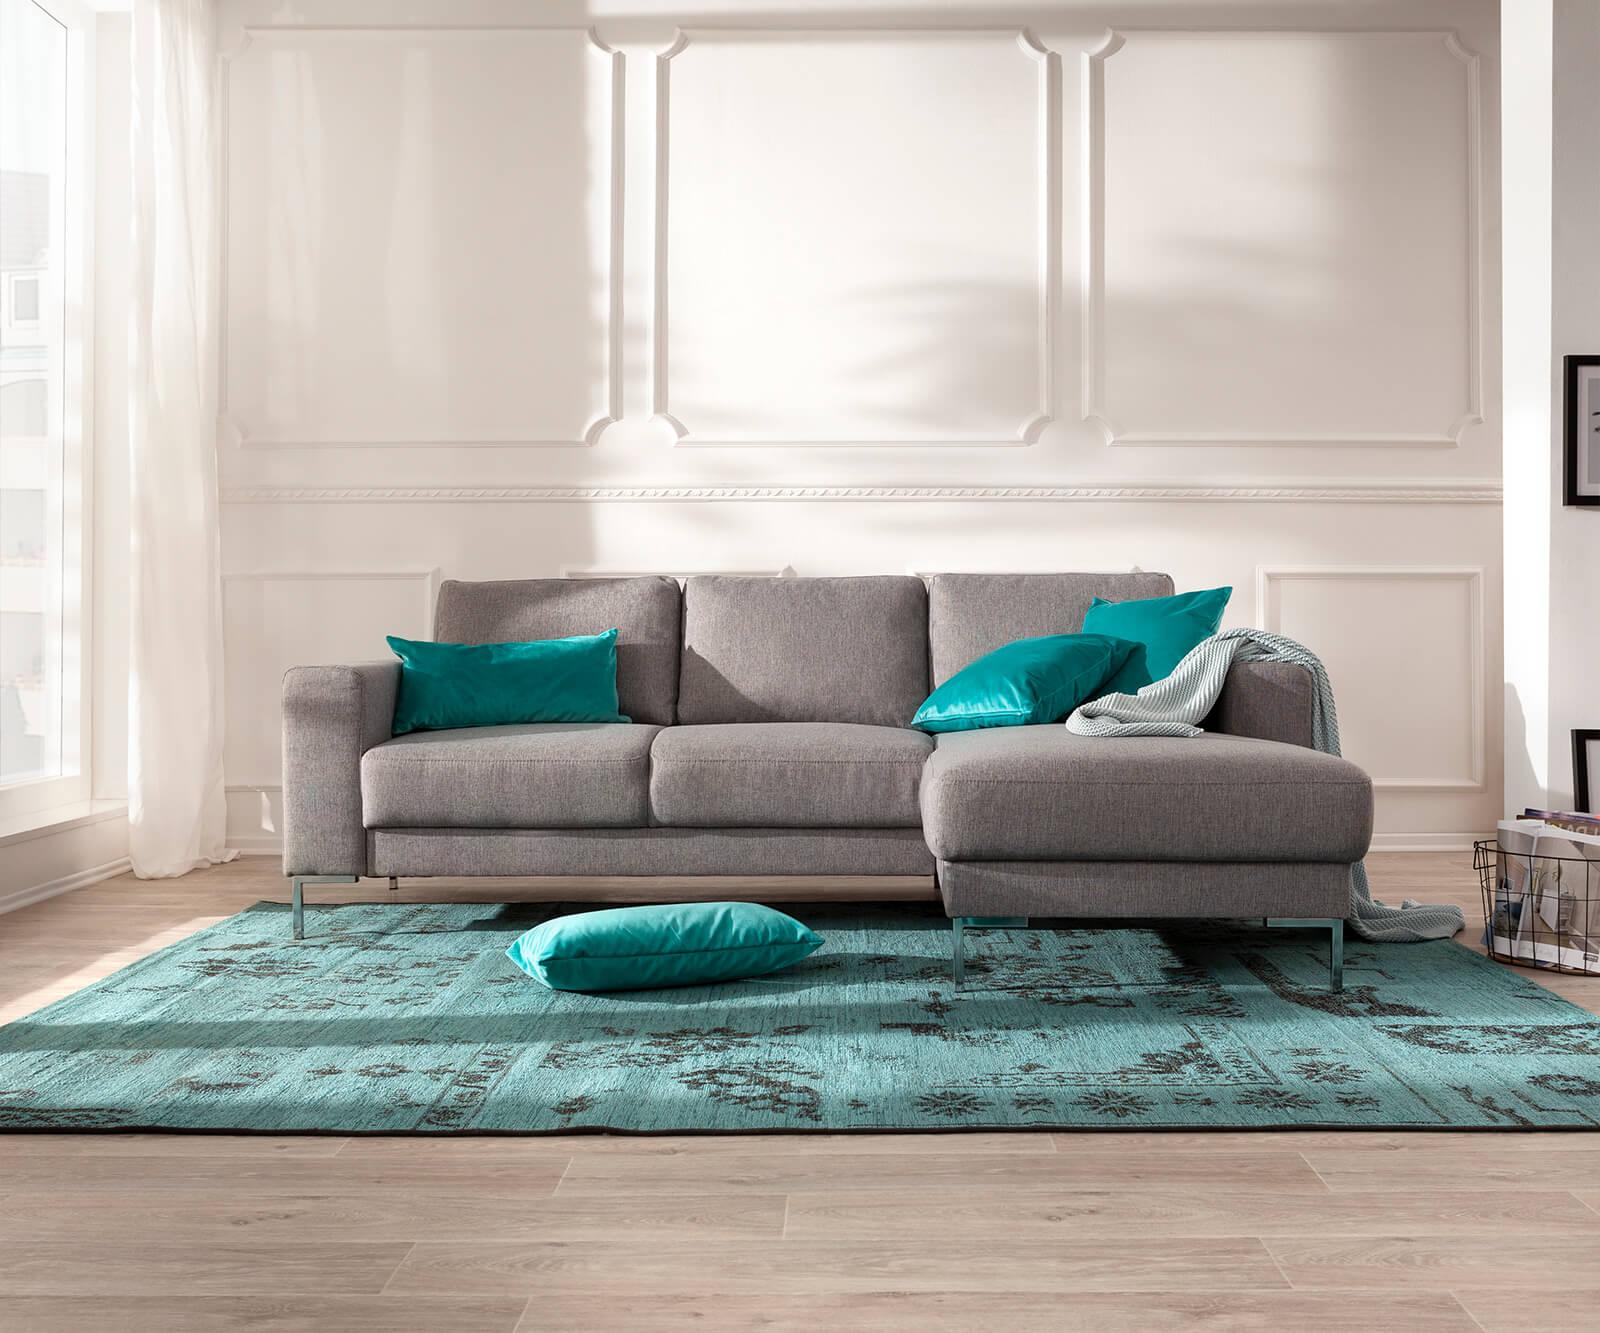 Designer-Ecksofa Silas 235x147 cm Grau Ottomane Rechts